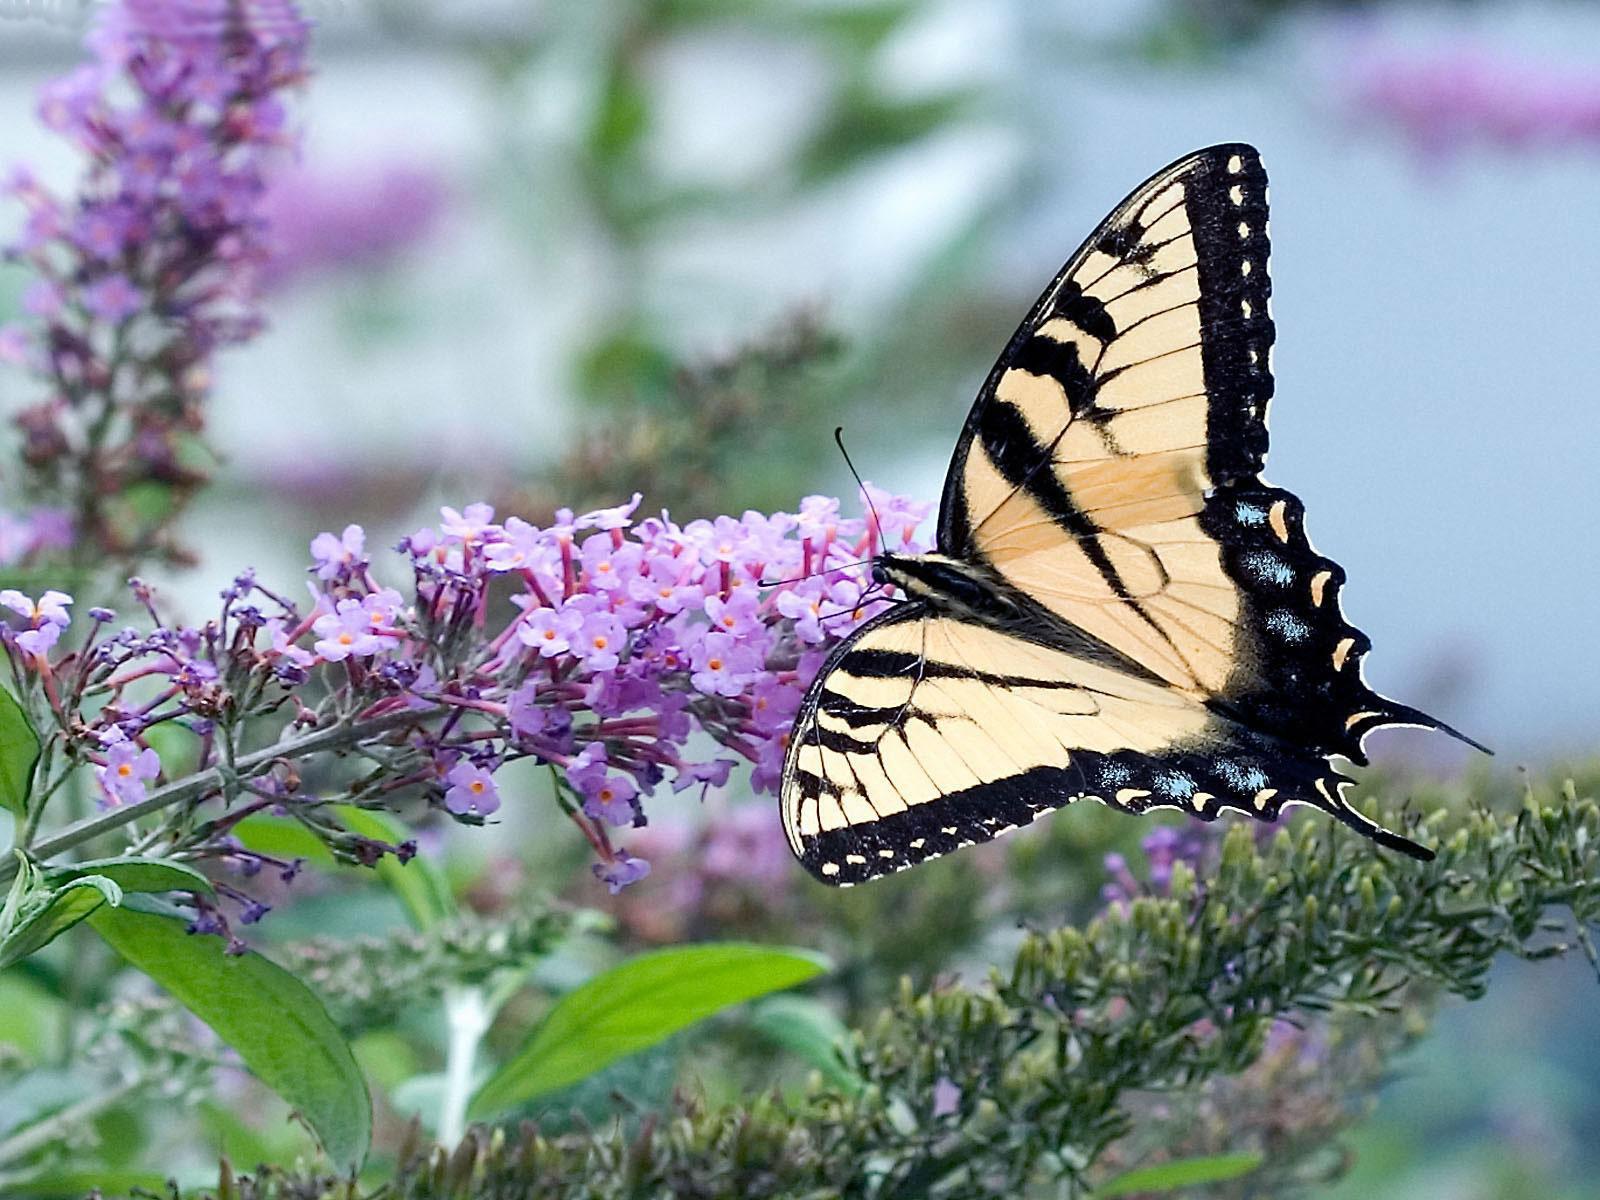 521 Entertainment World: Beautiful Butterfly Photos